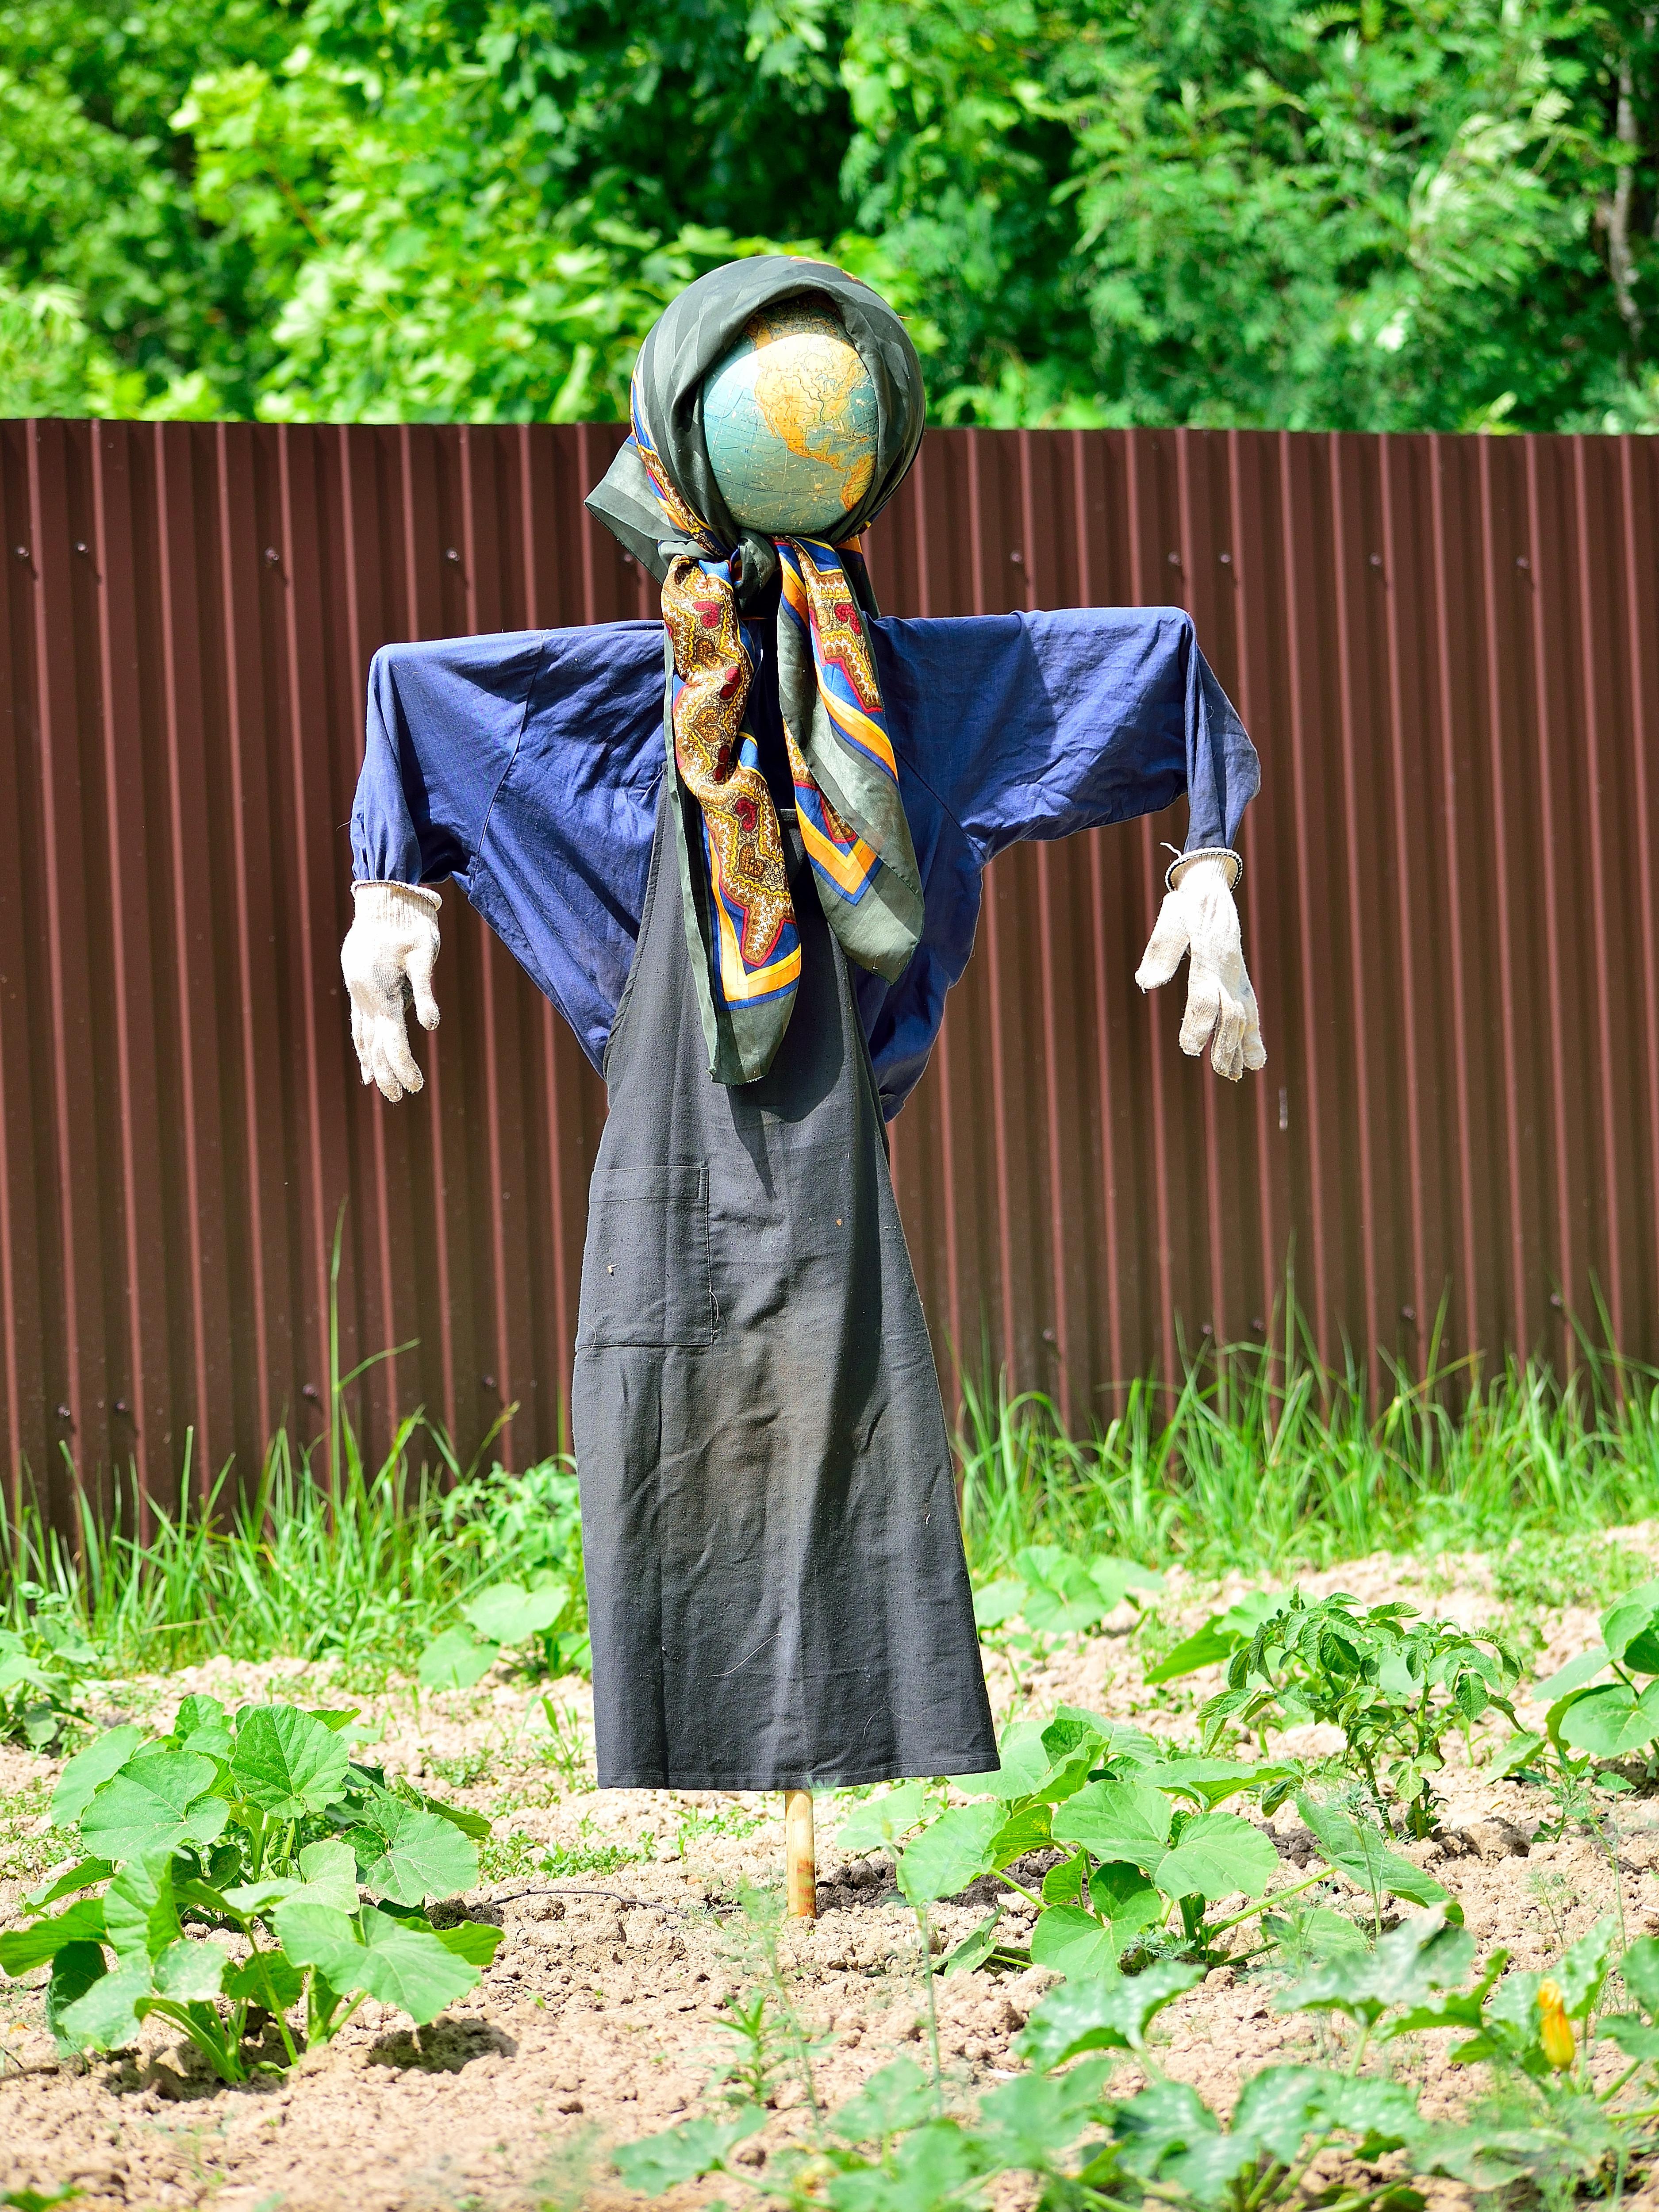 чучело в огород своими руками фото при